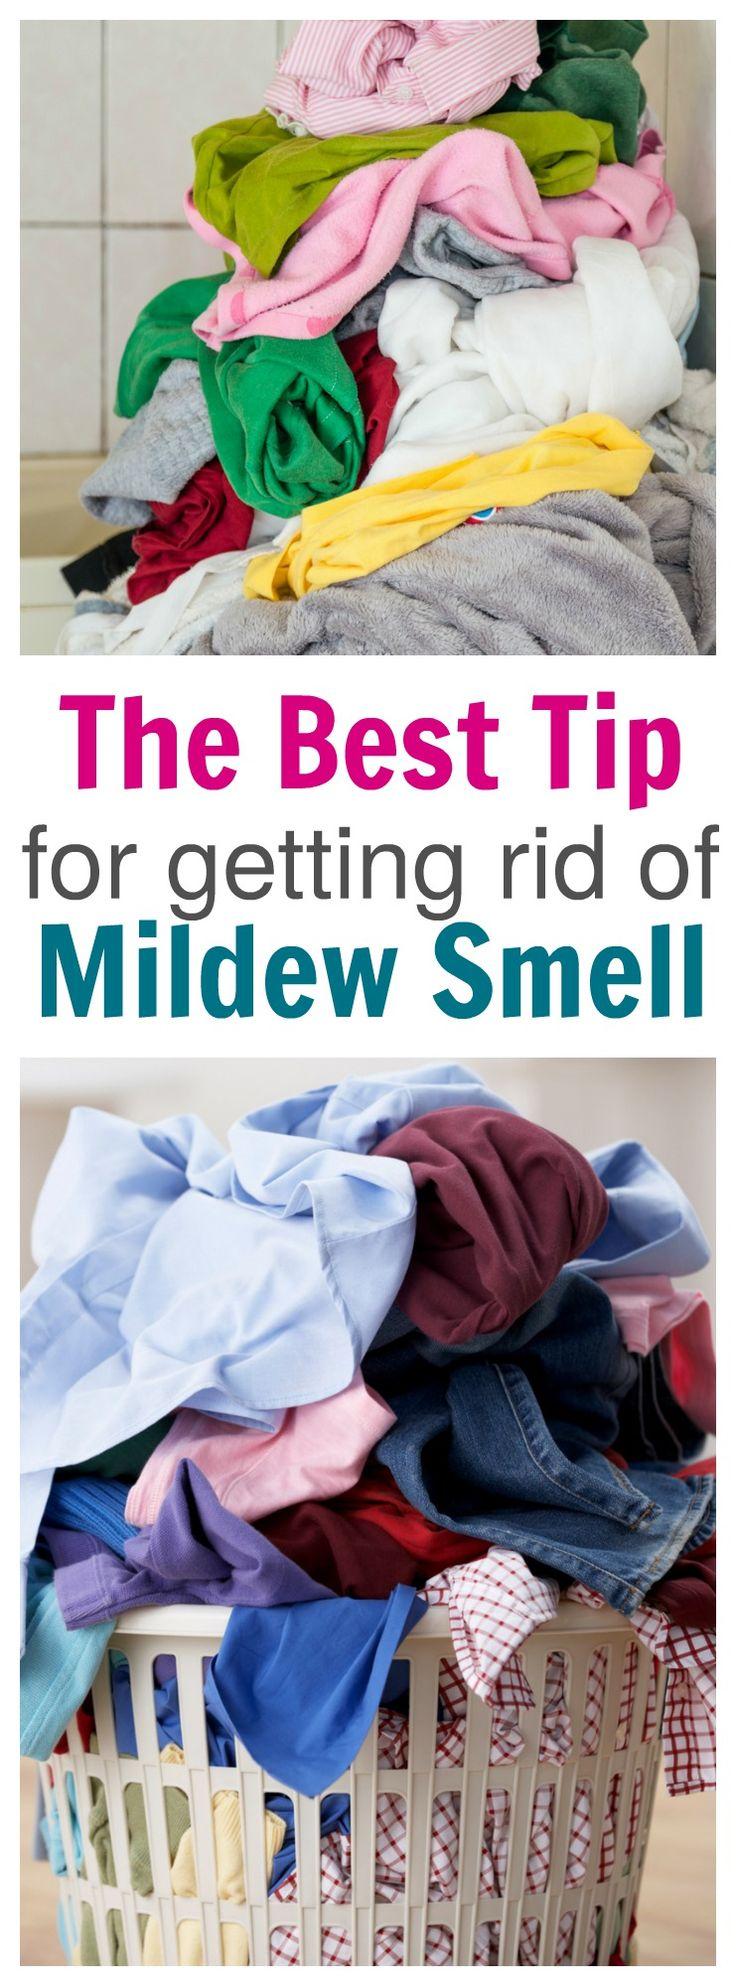 25 best ideas about clean mildew towels on pinterest freshen towels clean towels vinegar and. Black Bedroom Furniture Sets. Home Design Ideas